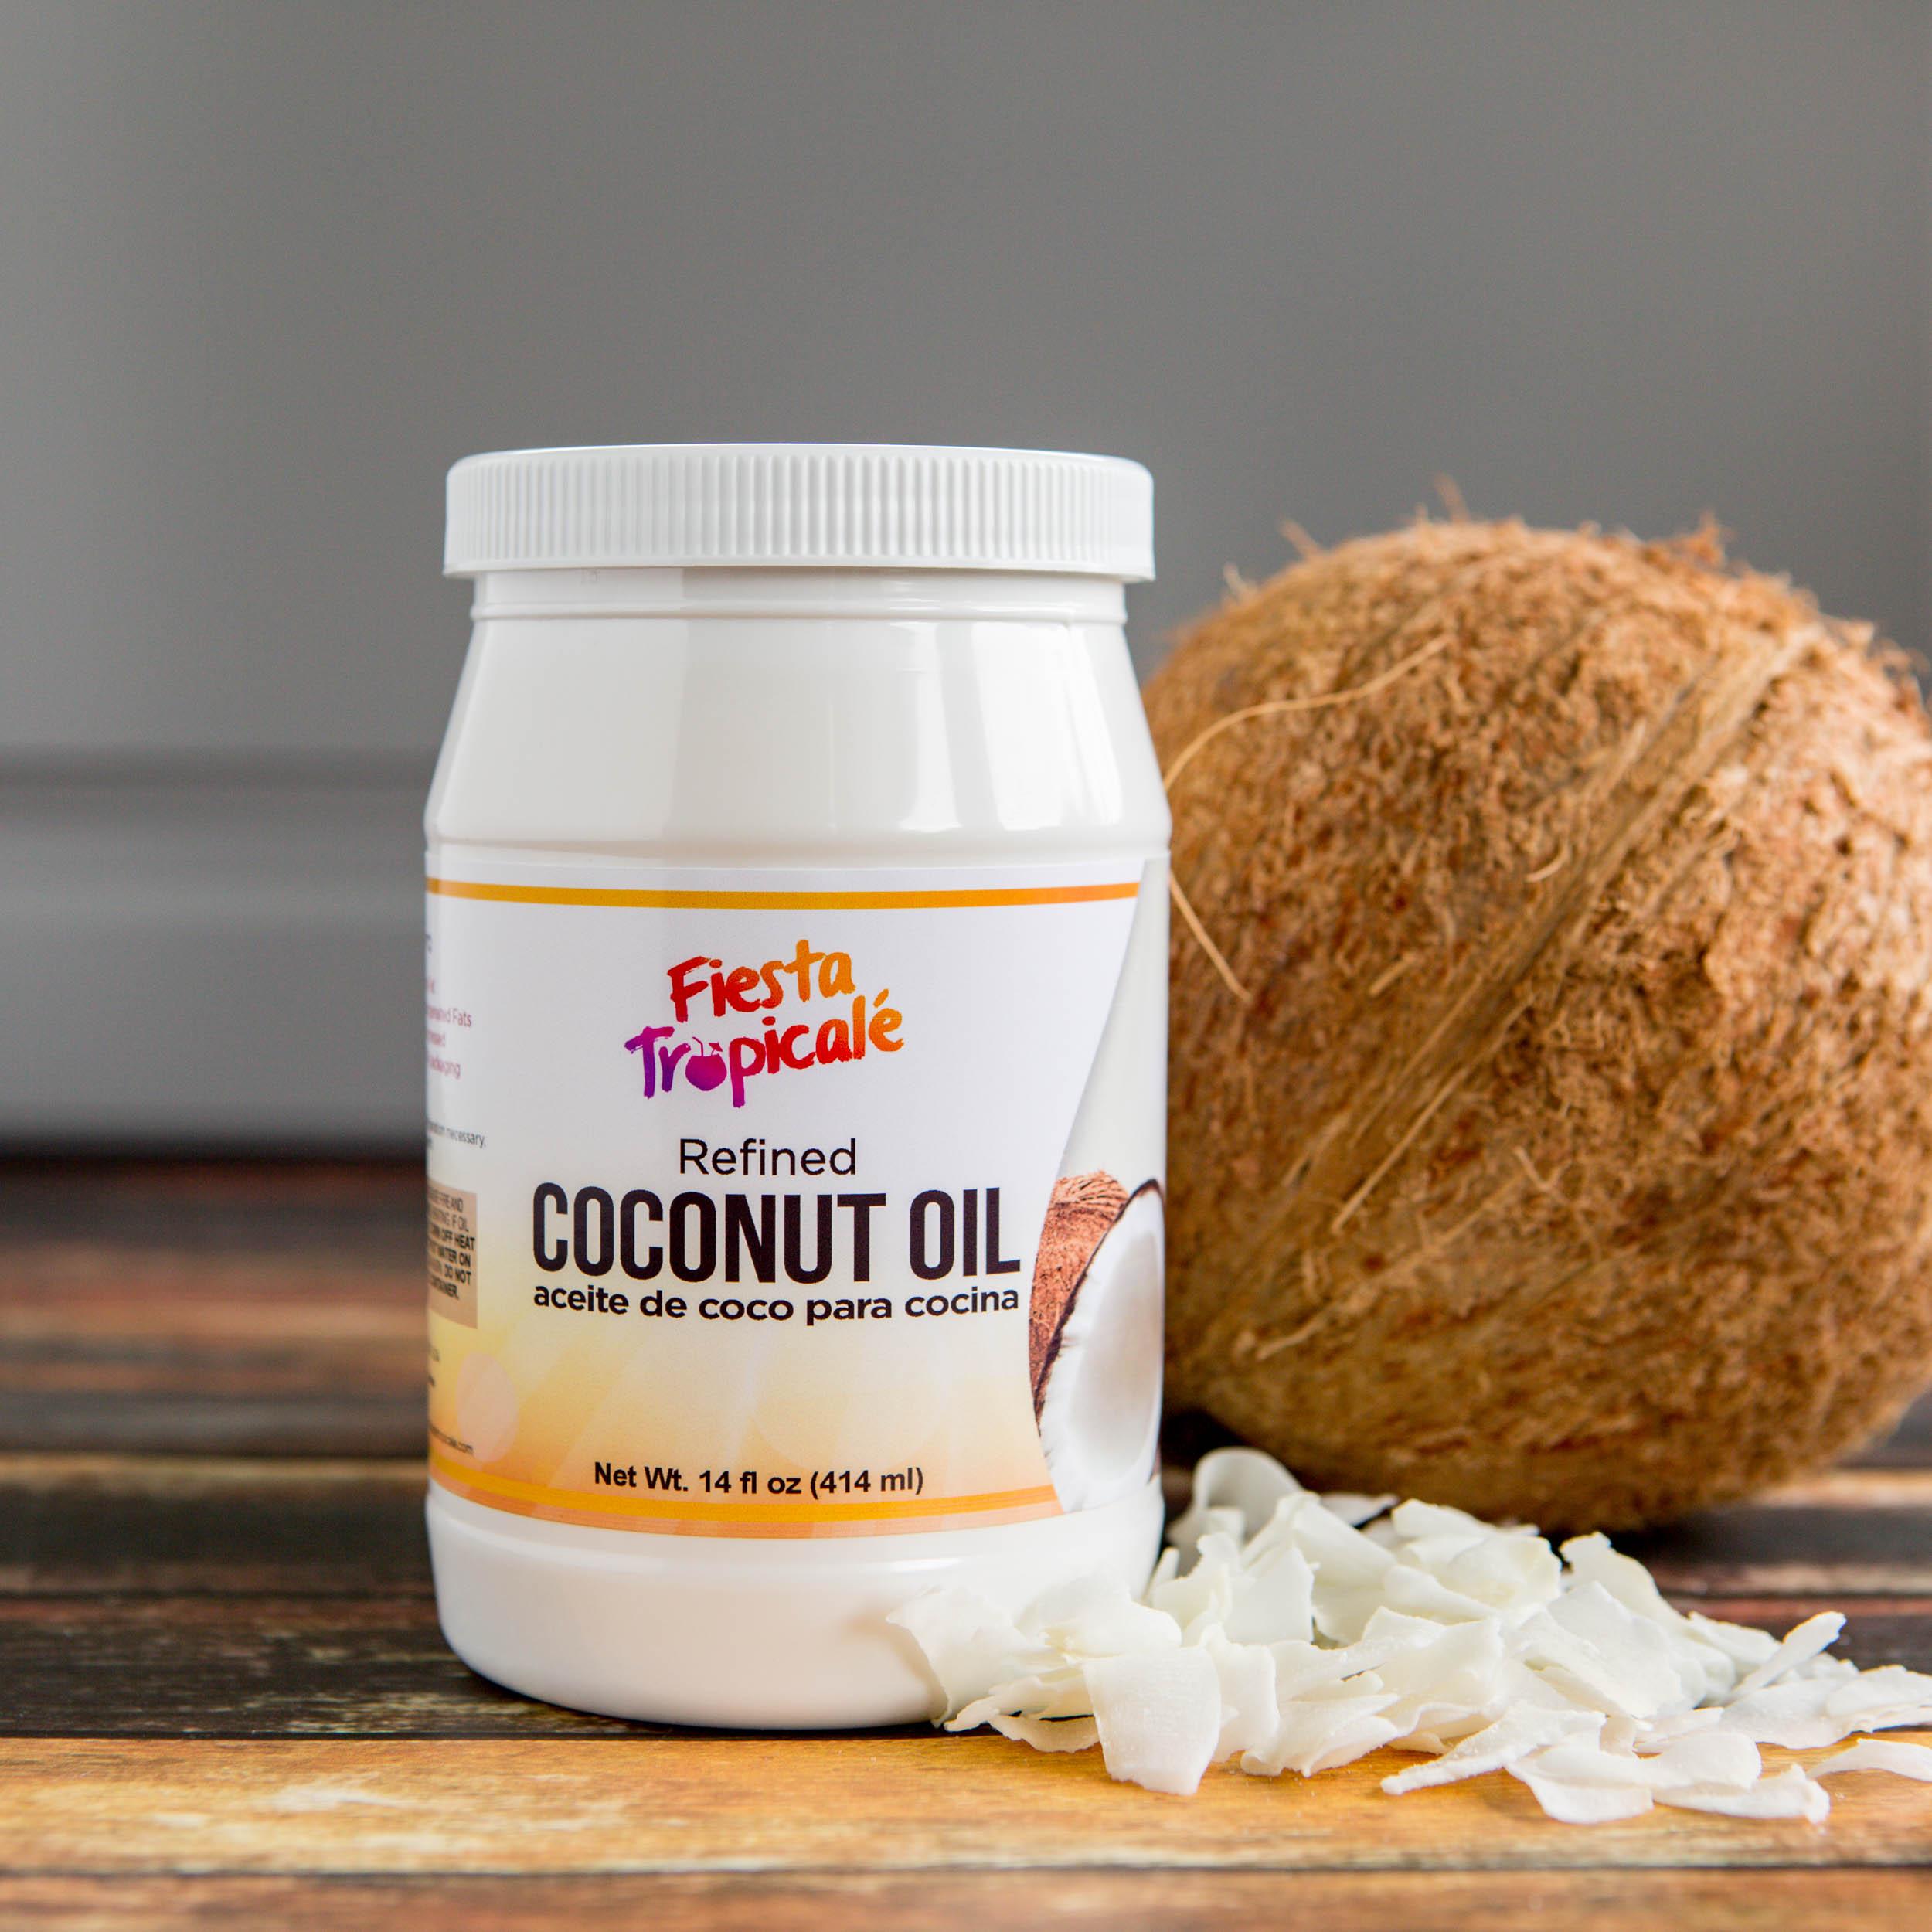 Fiesta Tropicale Refined Coconut Oil